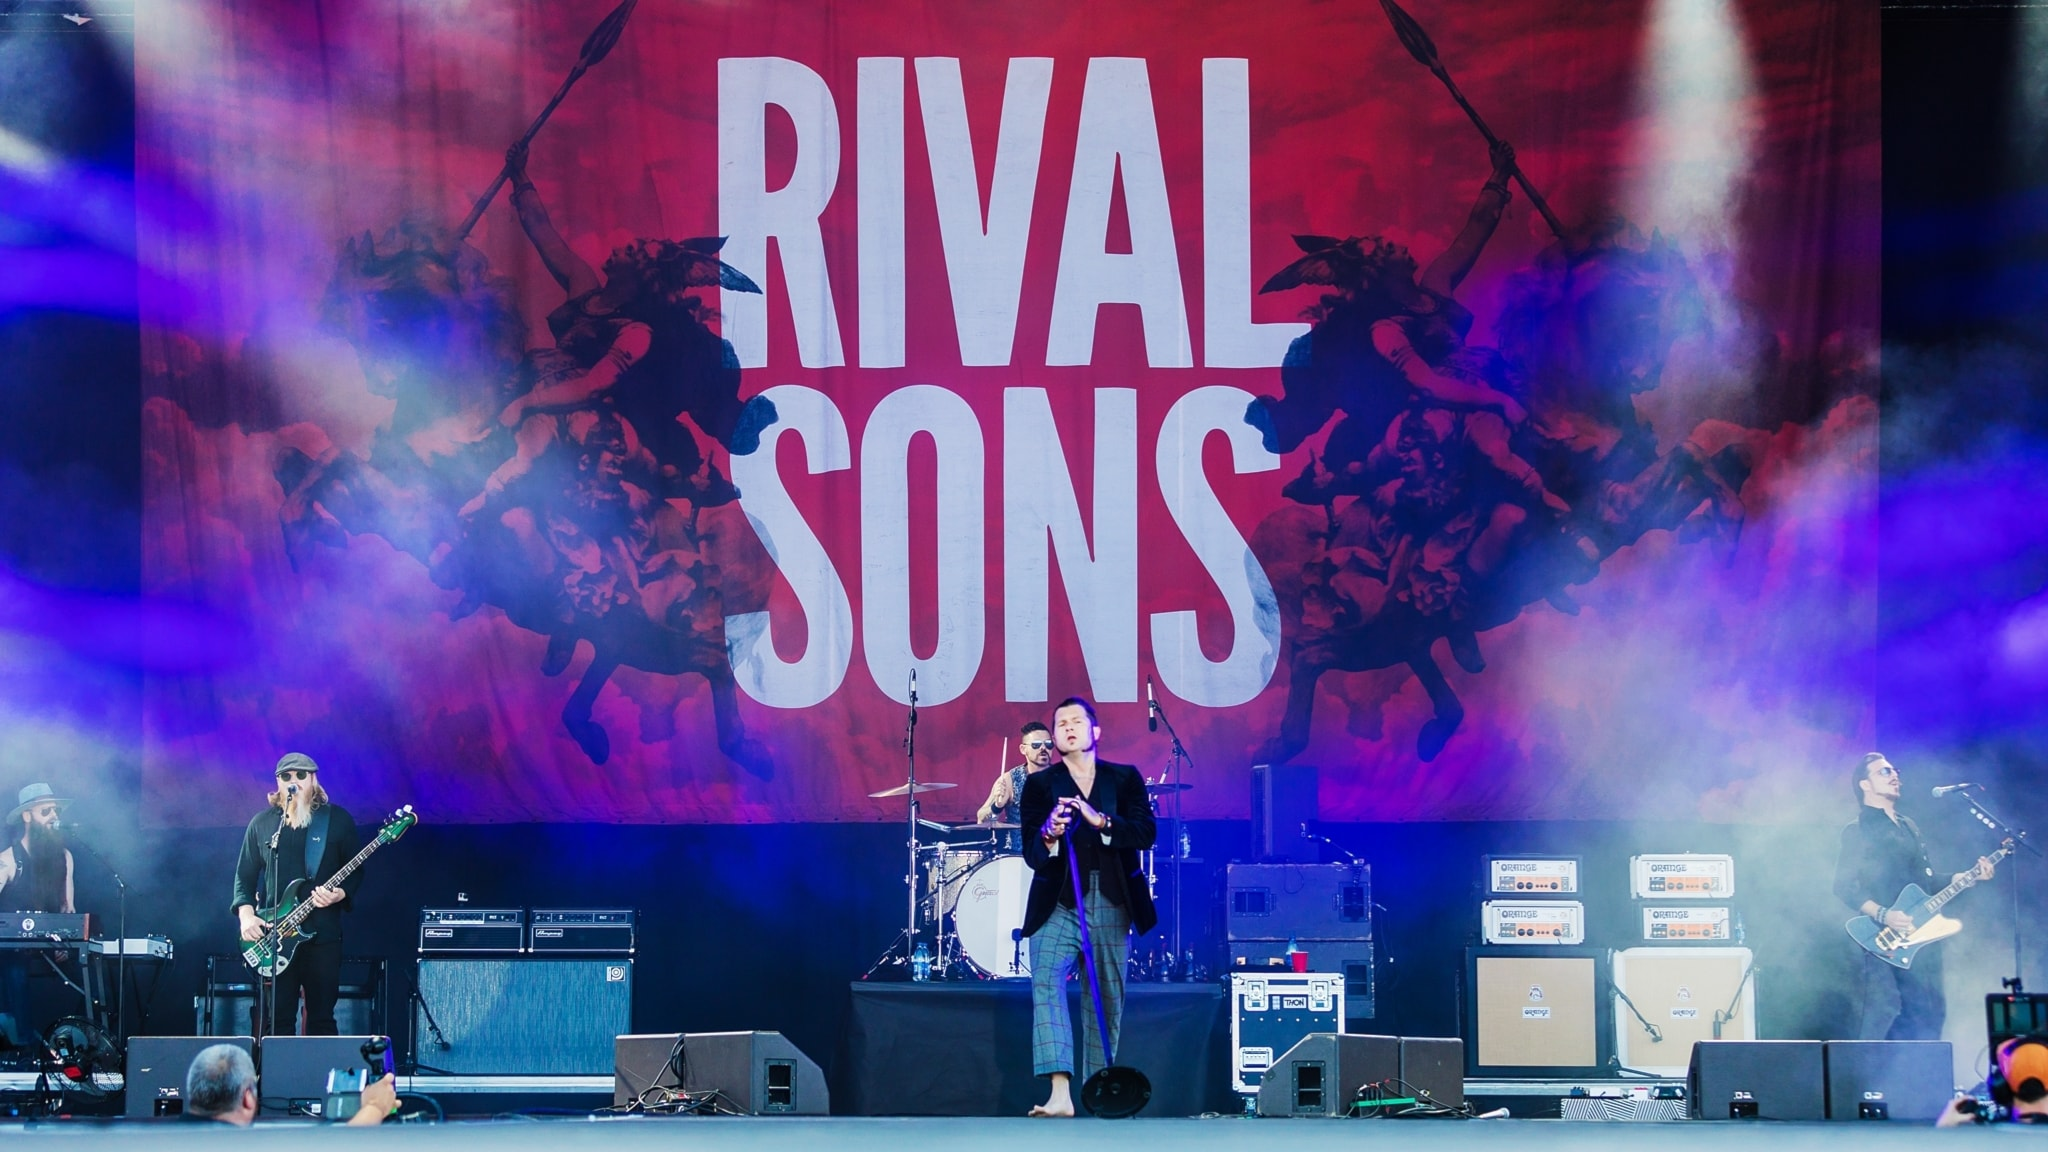 P4 Live med Rival Sons från Sweden Rock Festival 2017